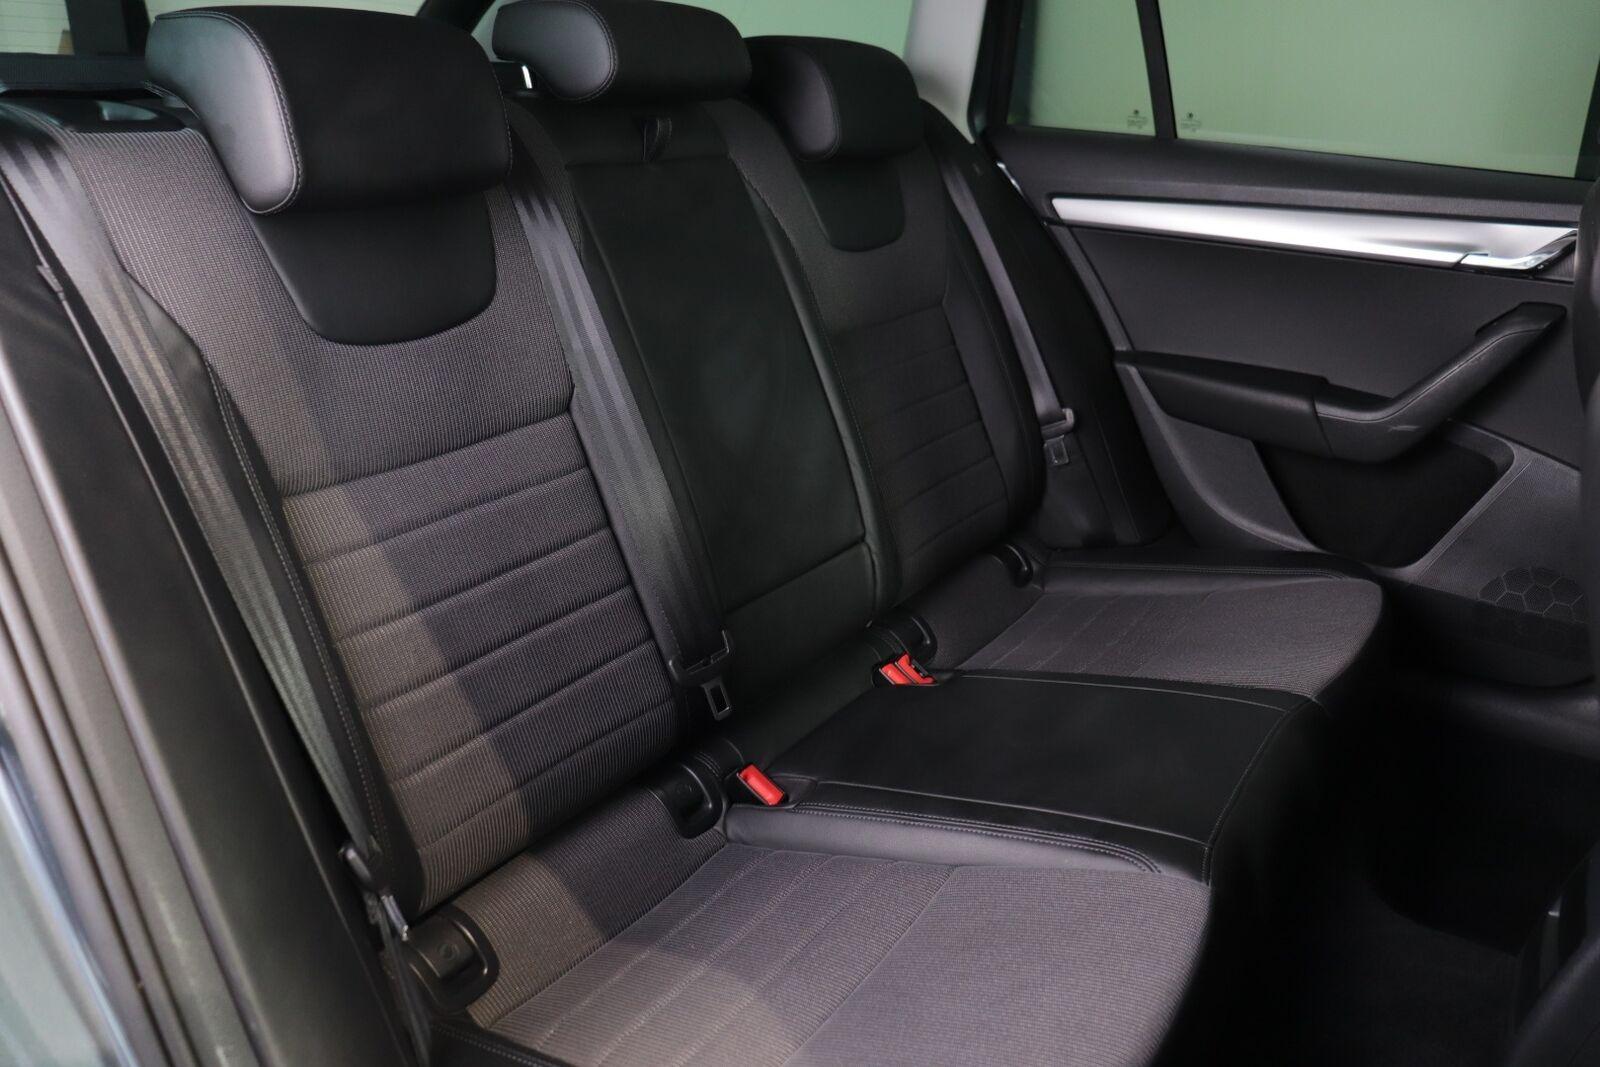 Skoda Octavia TDi 110 Style Combi